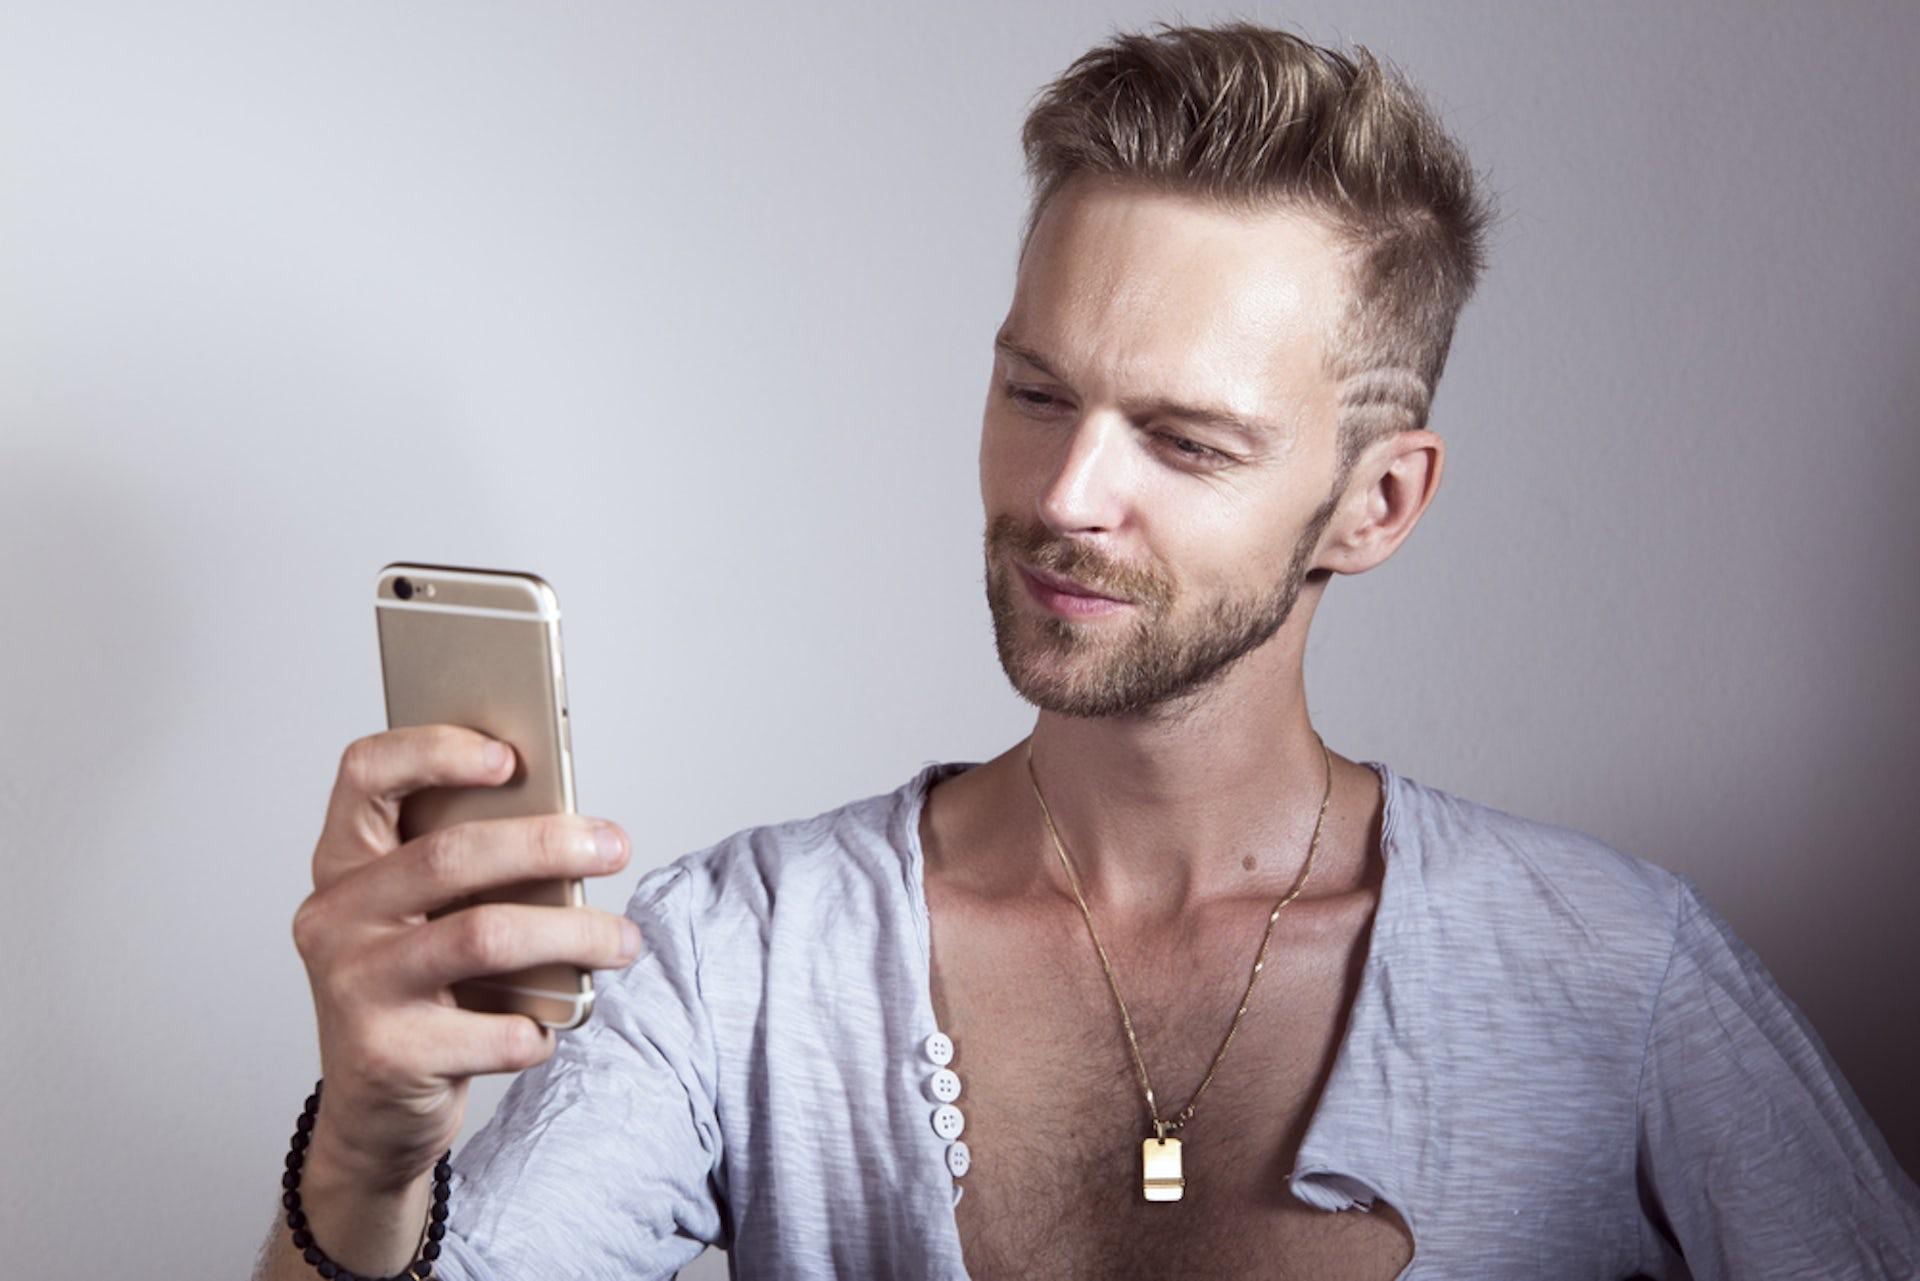 fake dating site photos